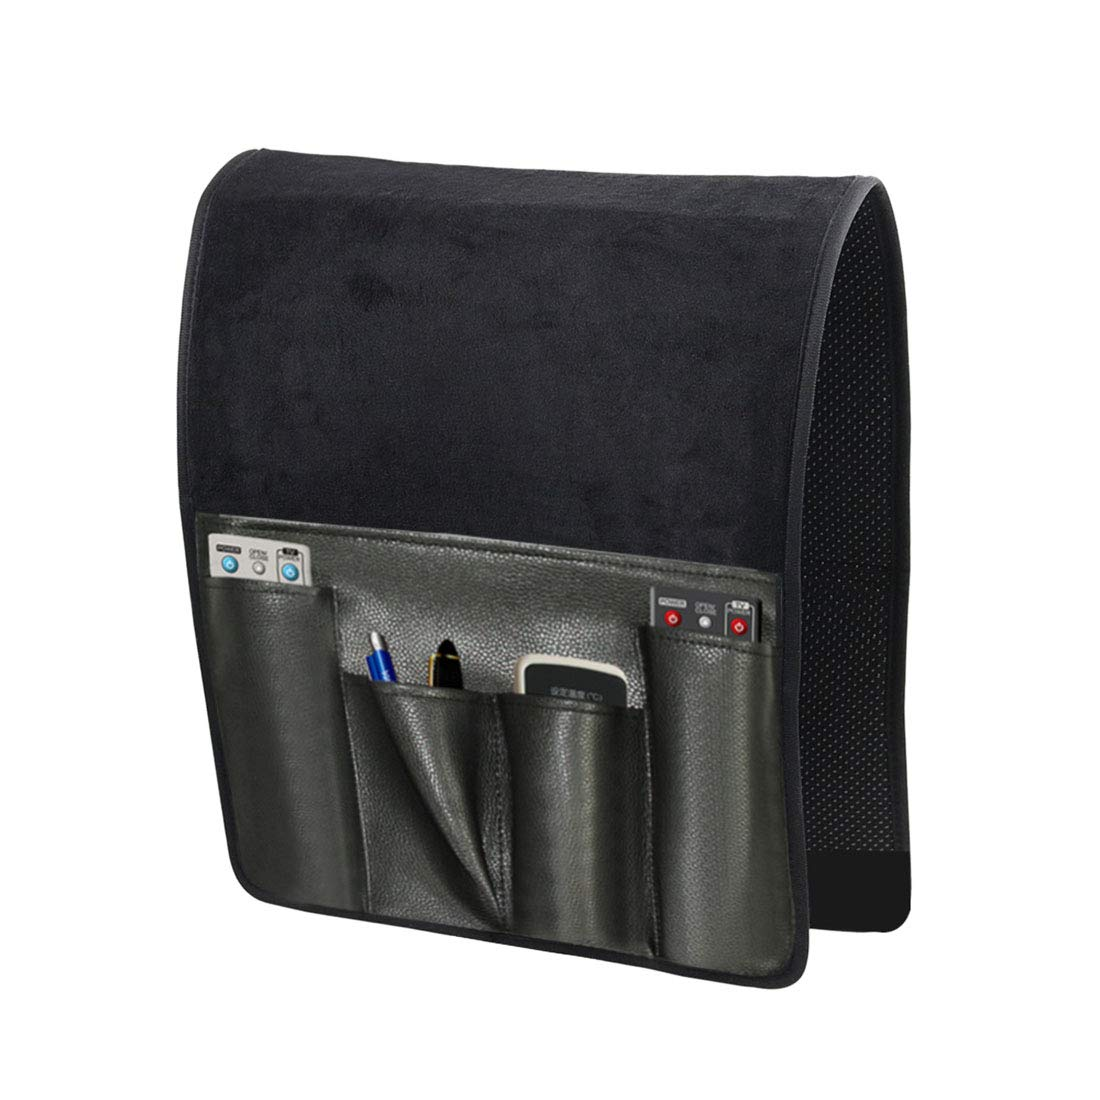 Enerhu Sofa Armrest Organizer Couch Chair Caddy Organiser for TV Remote Phone Holder Storage Bag Coffee